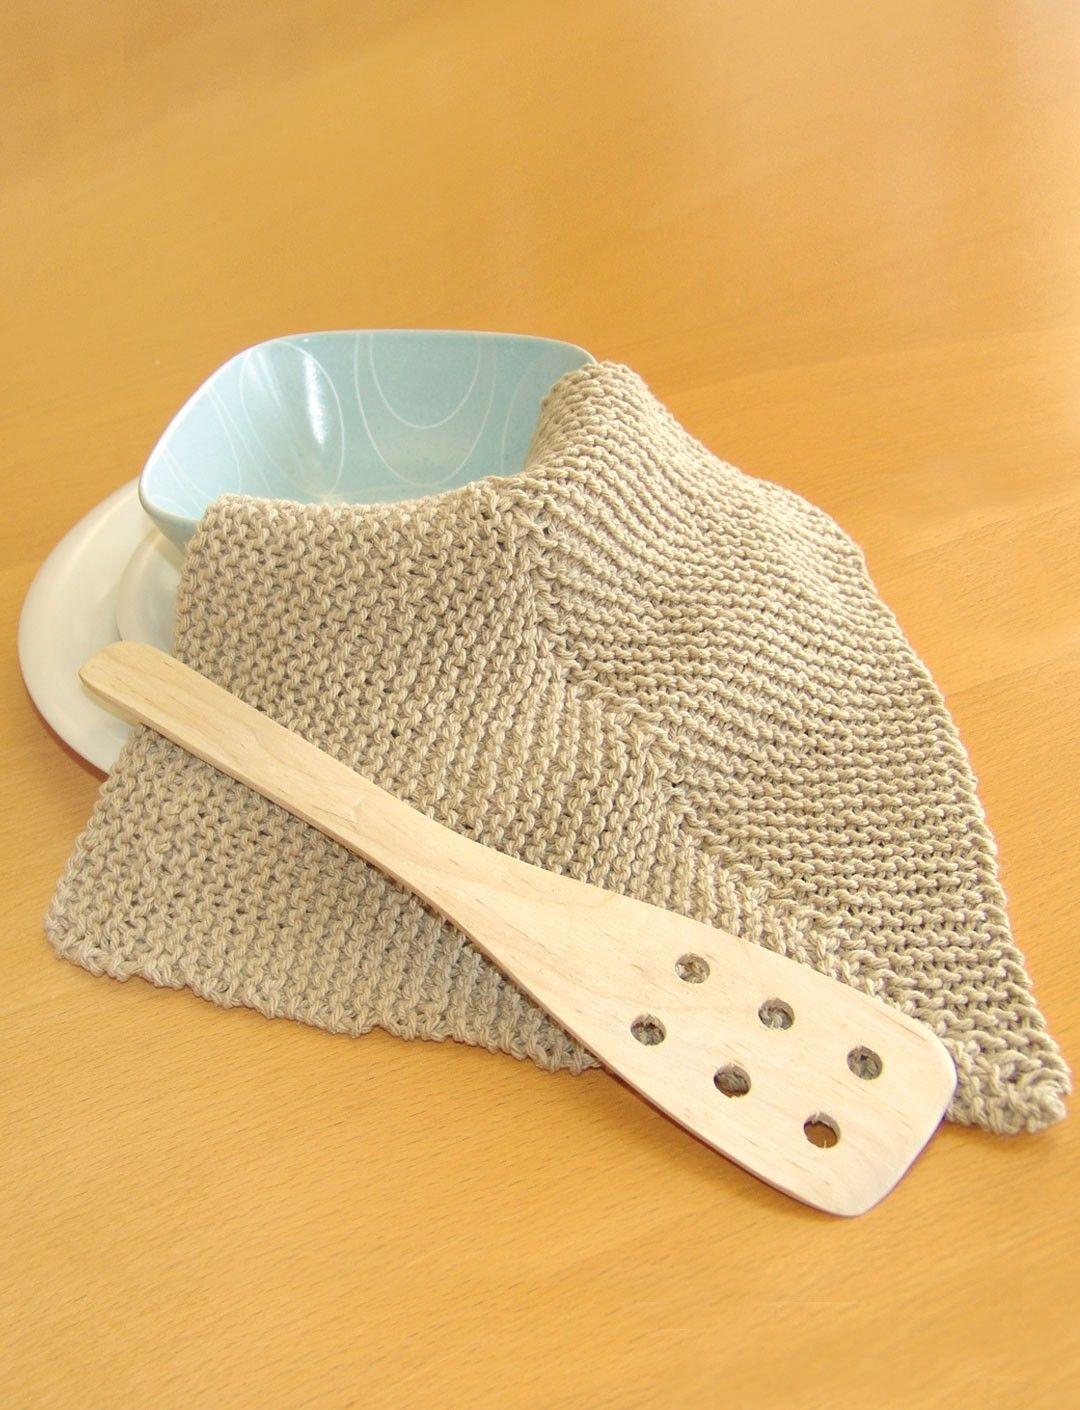 Yarnspirations.com - Bernat Mitered Dishcloth - Patterns ...